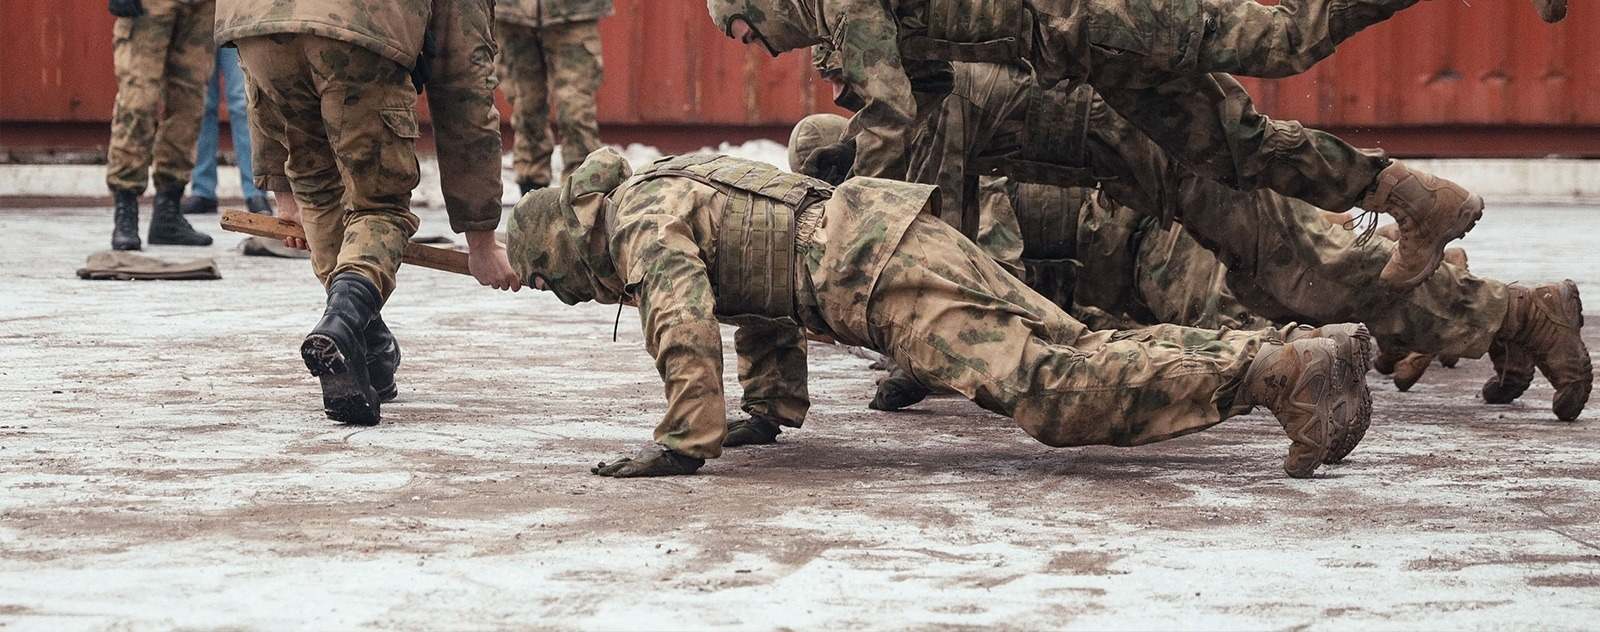 what is spetsnaz training like